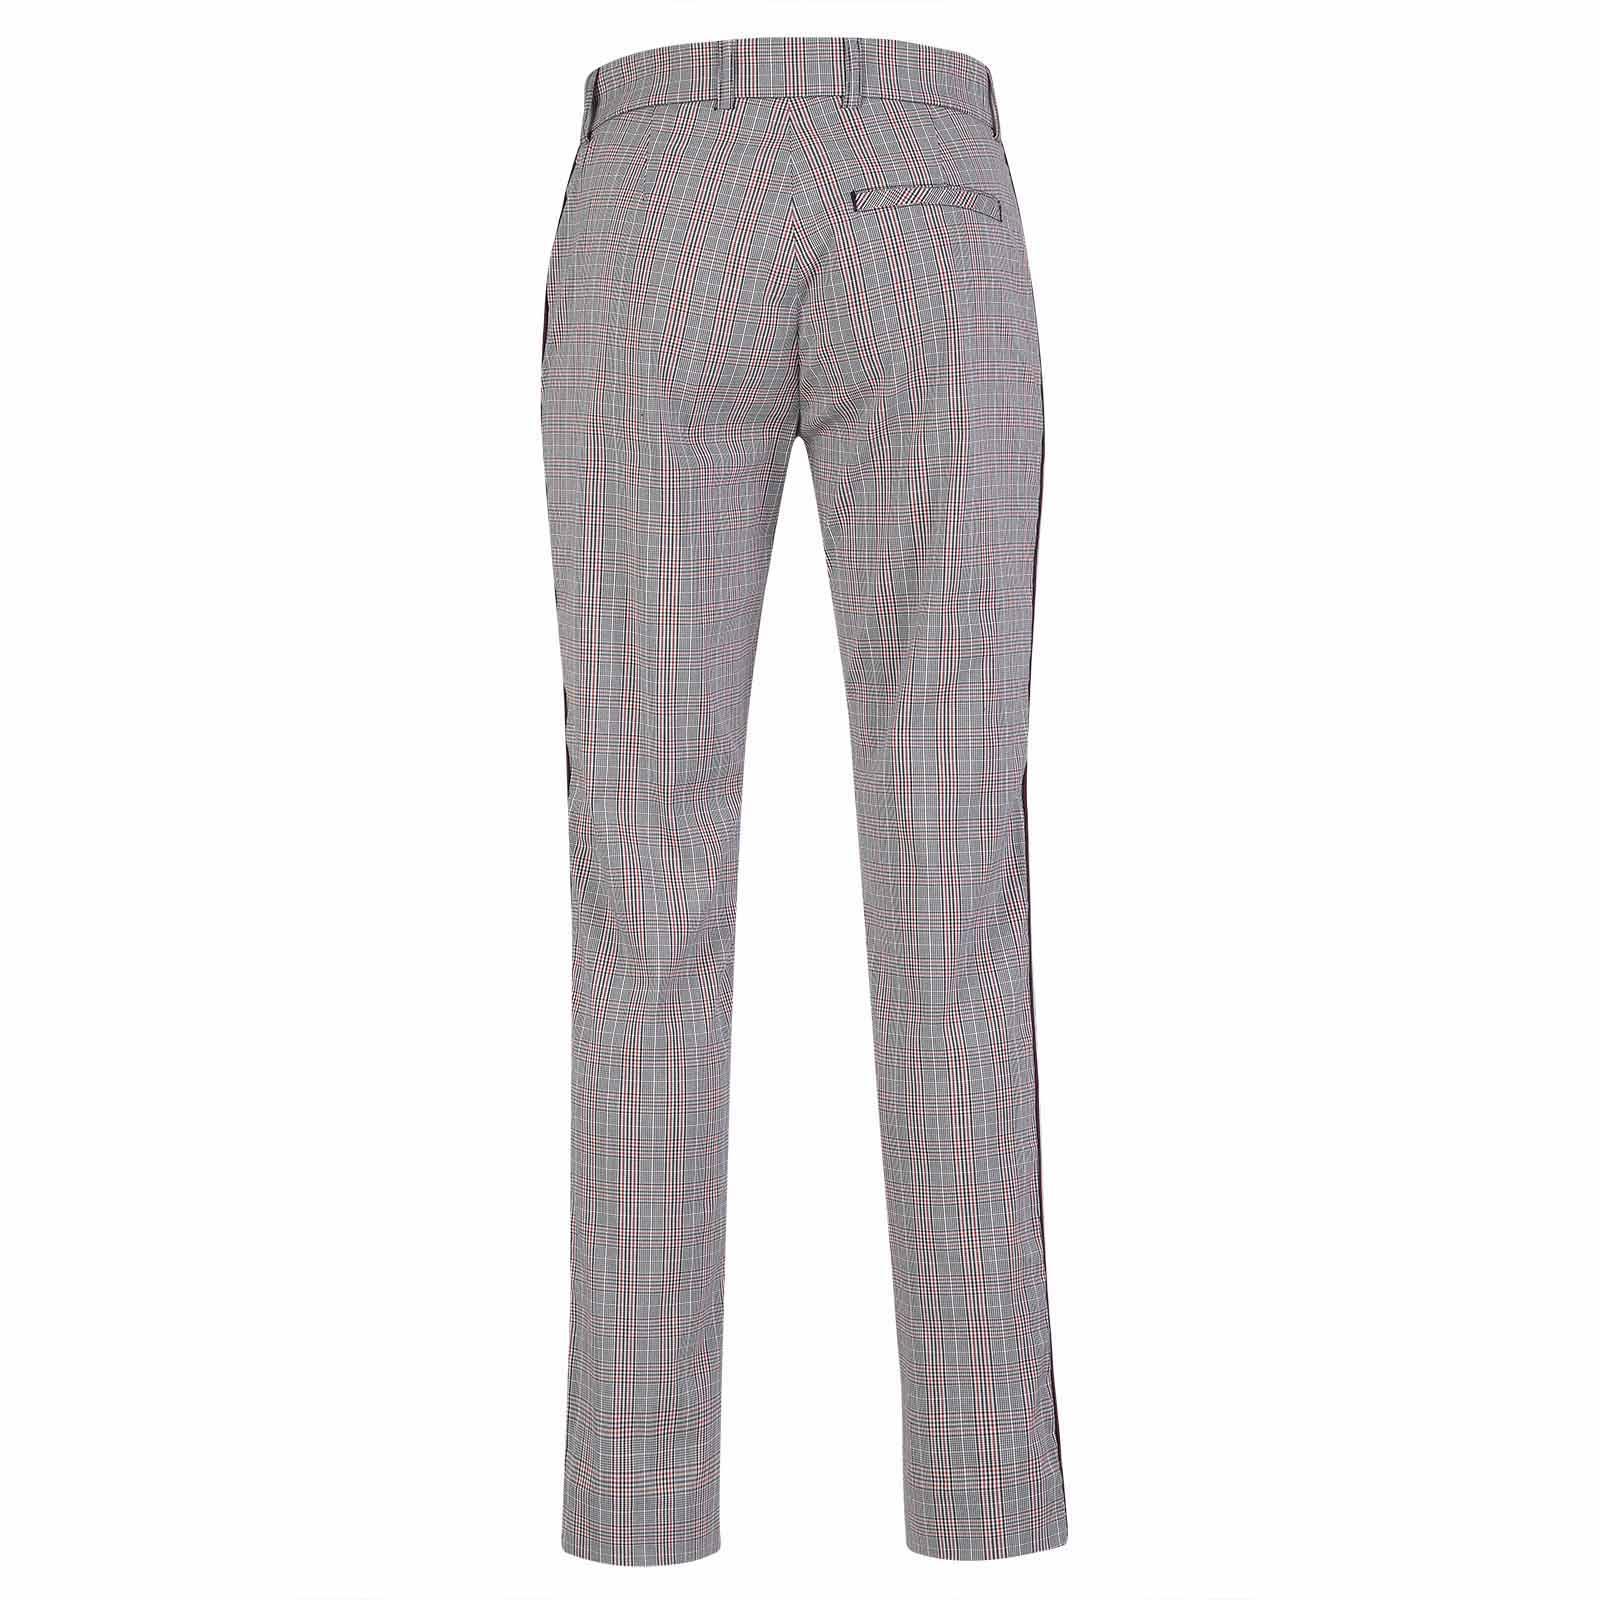 Damen 7/8-Golfhose aus Stretch-Material mit Karomuster in Regular Fit